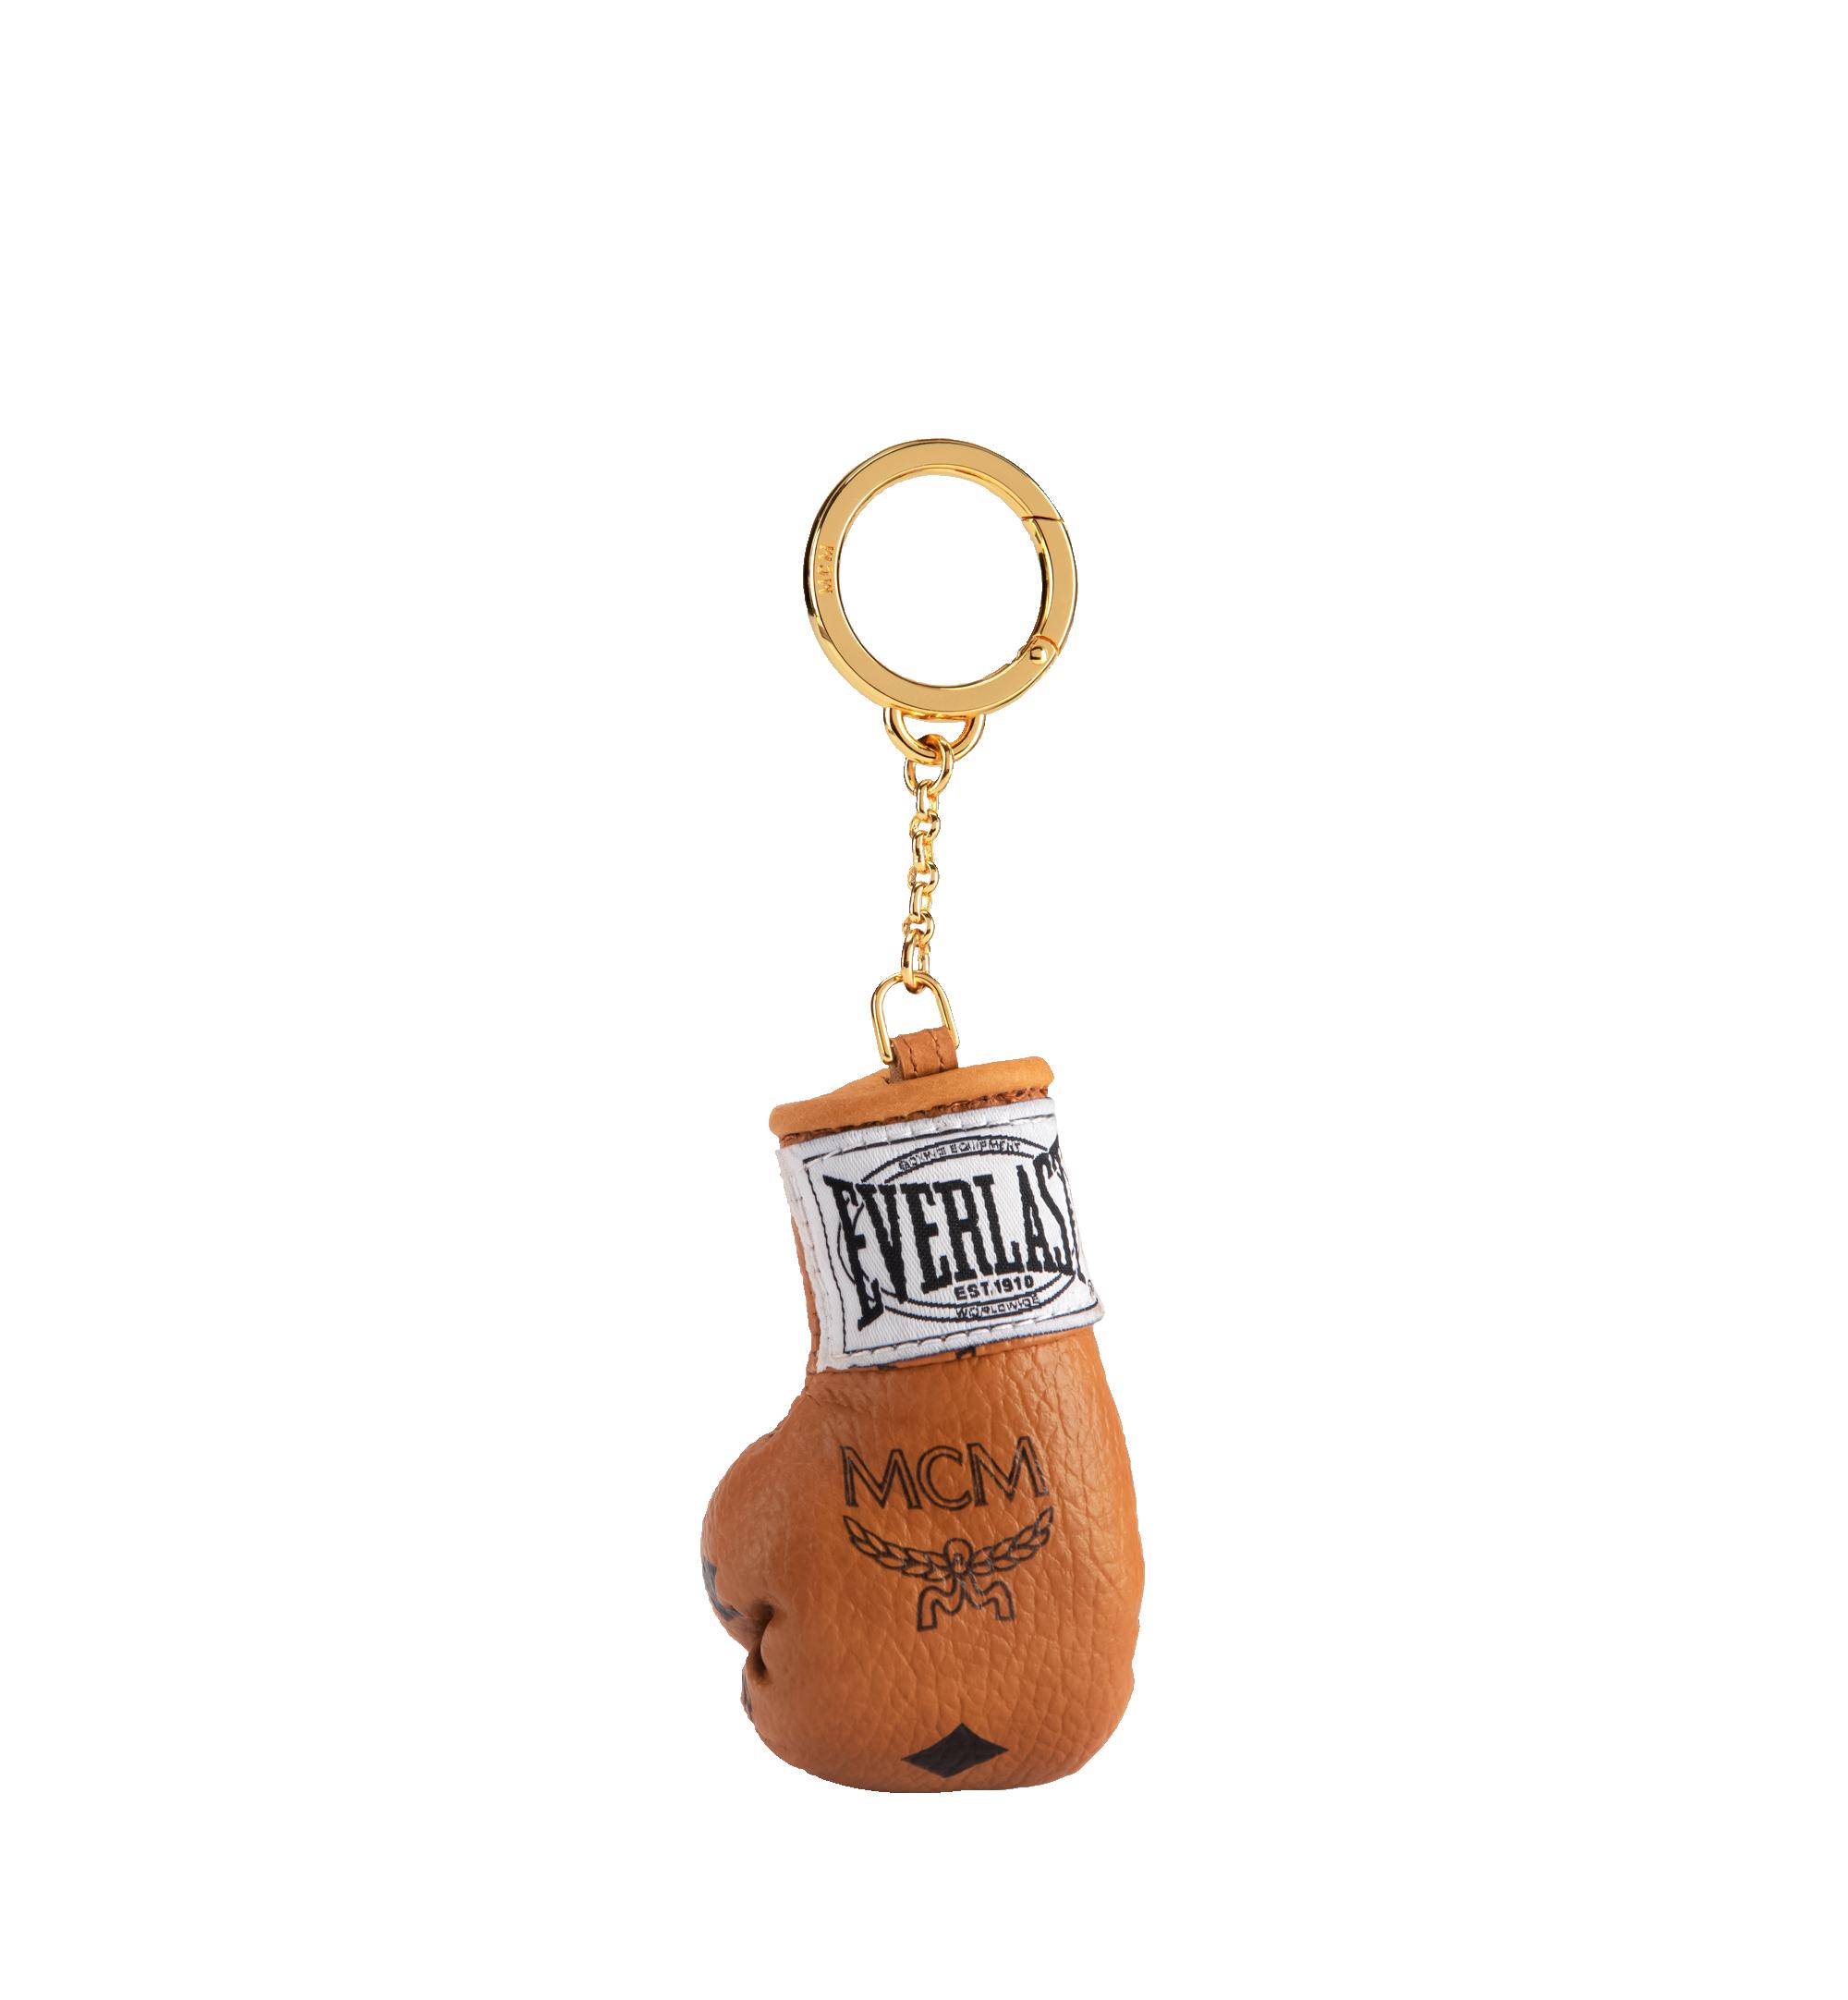 db4cca29f89 Boxing Glove Charm in Visetos